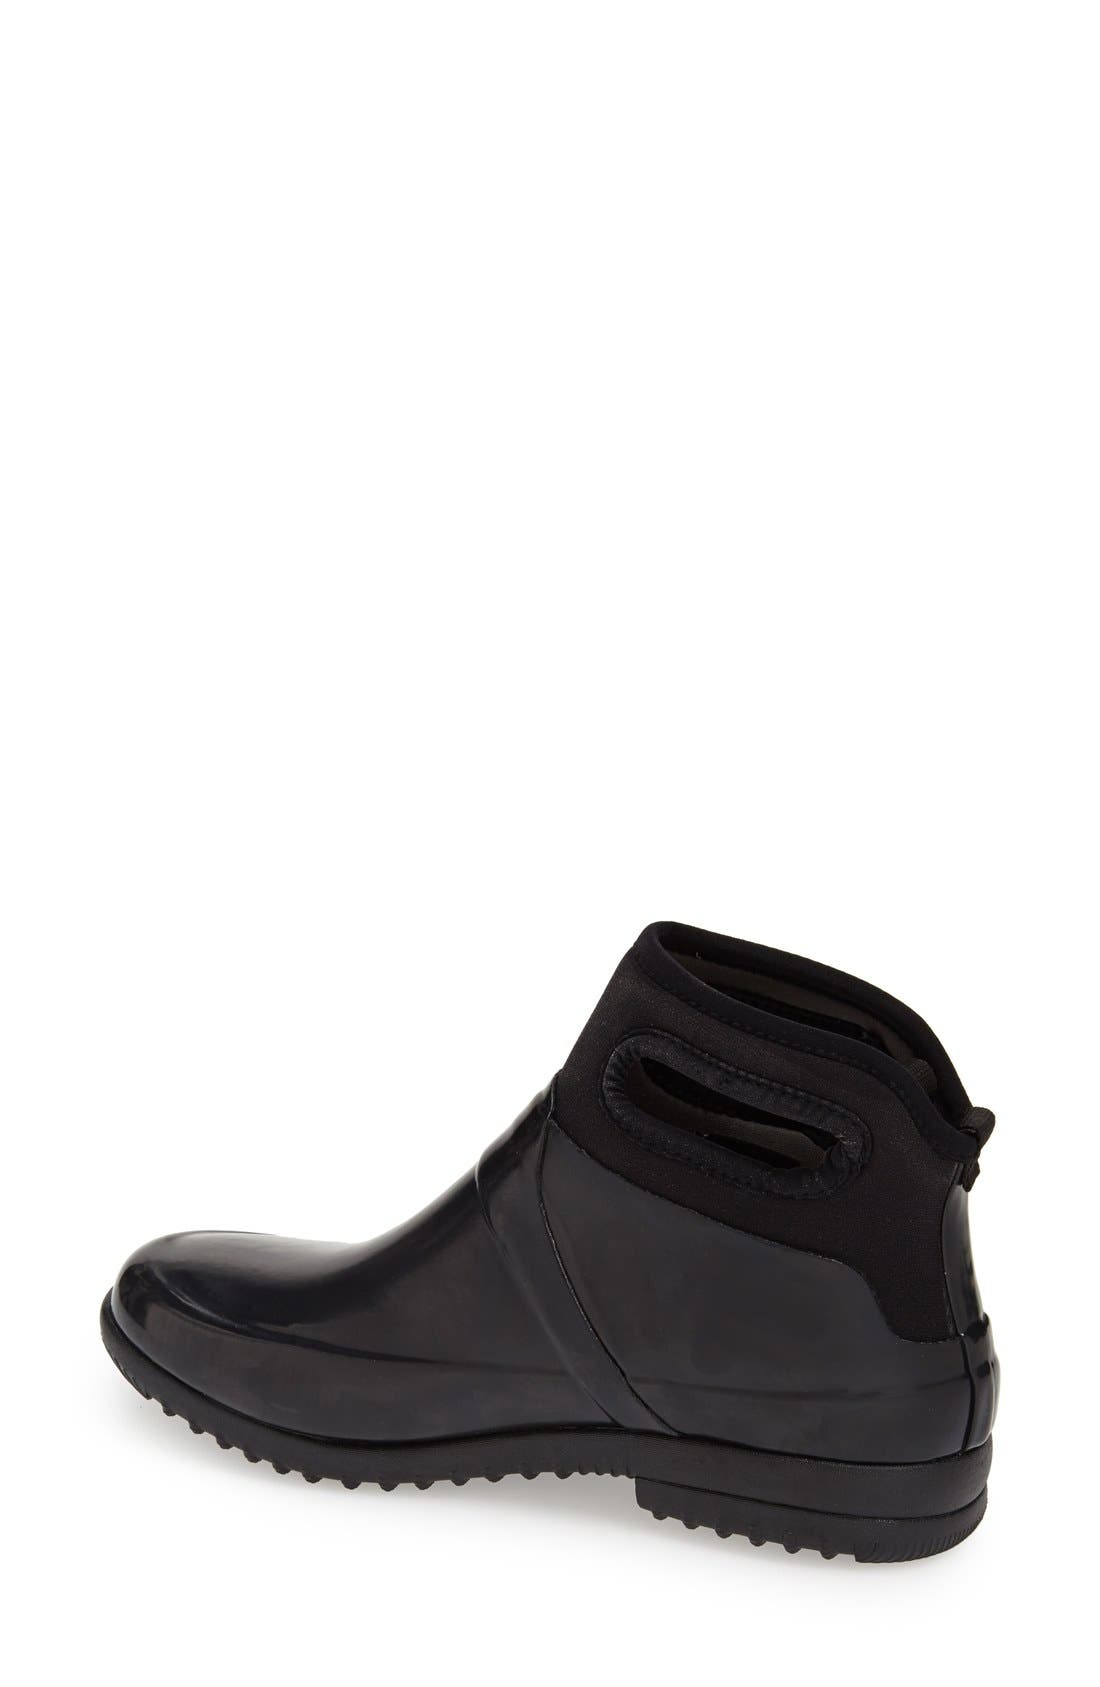 'Seattle' Waterproof Short Boot,                             Alternate thumbnail 2, color,                             Black